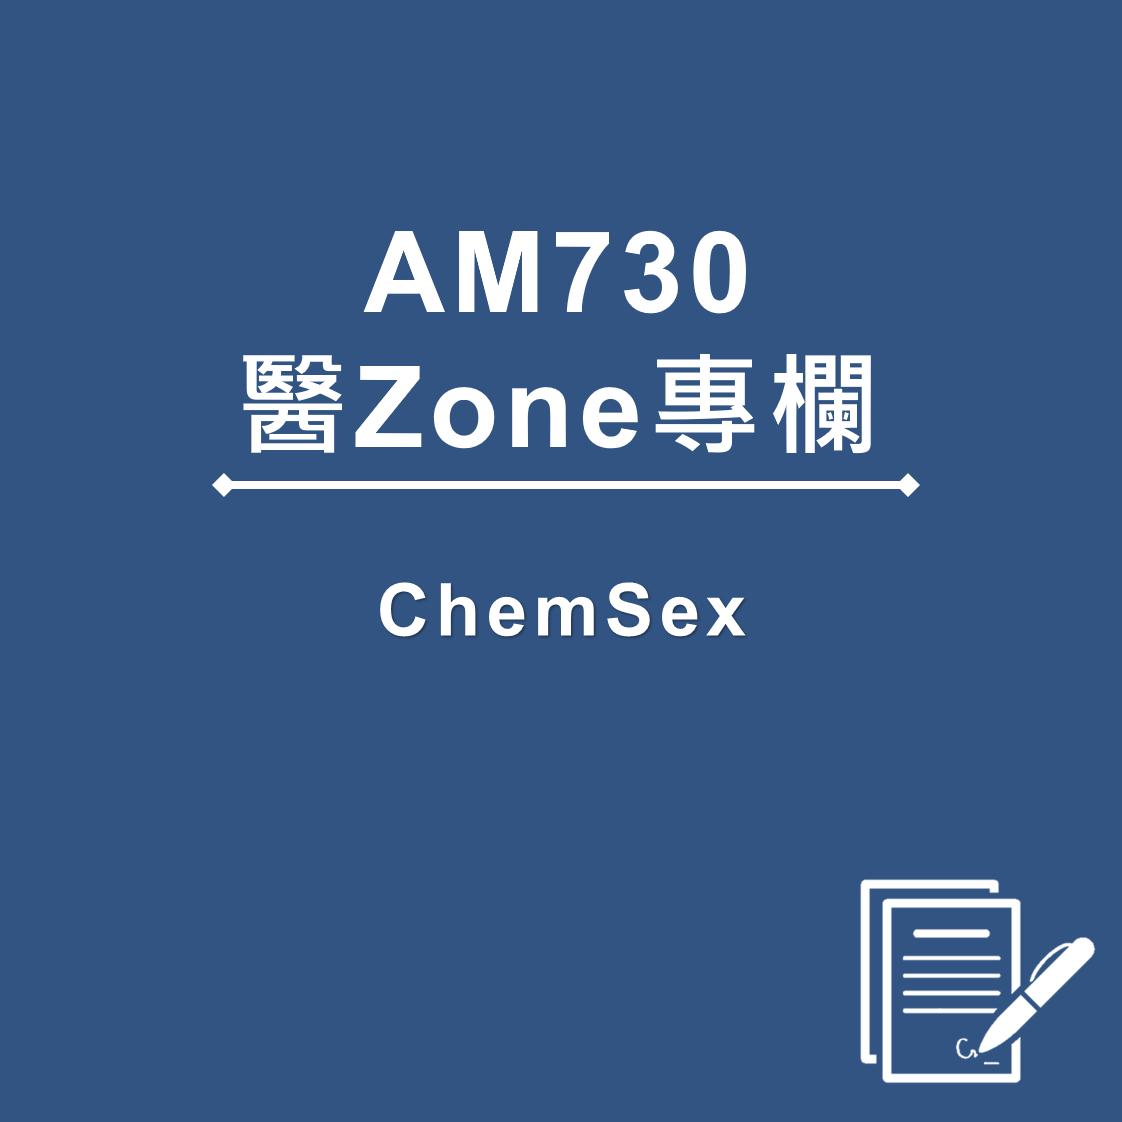 AM730 醫Zone 專欄 - ChemSex